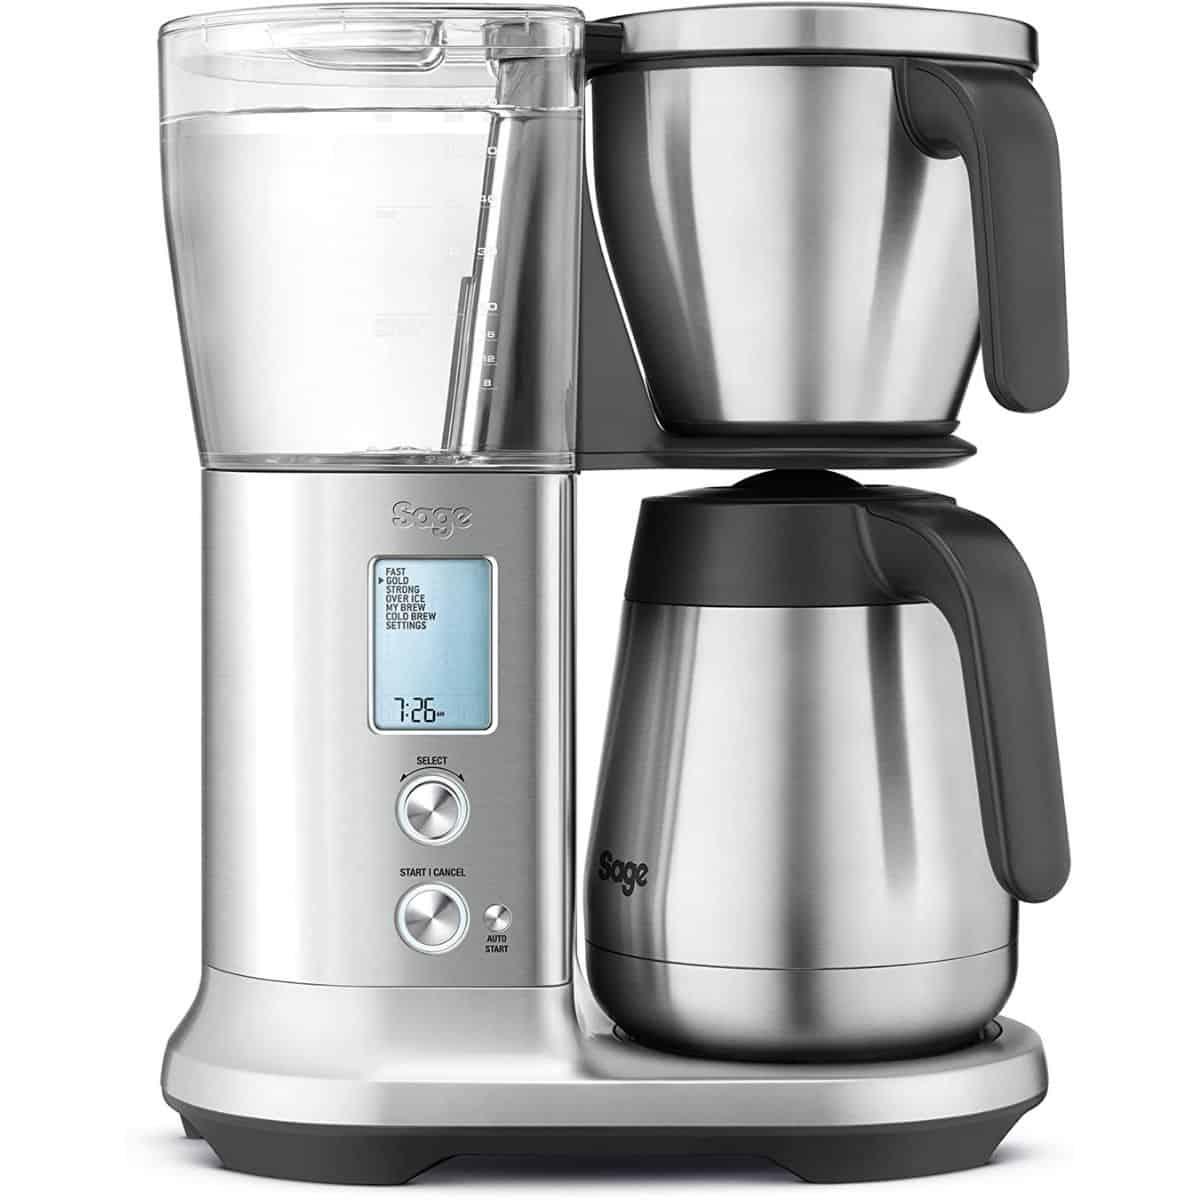 Sage Appliances SDC450 The Precision Brewer Thermal Kaffeemaschine